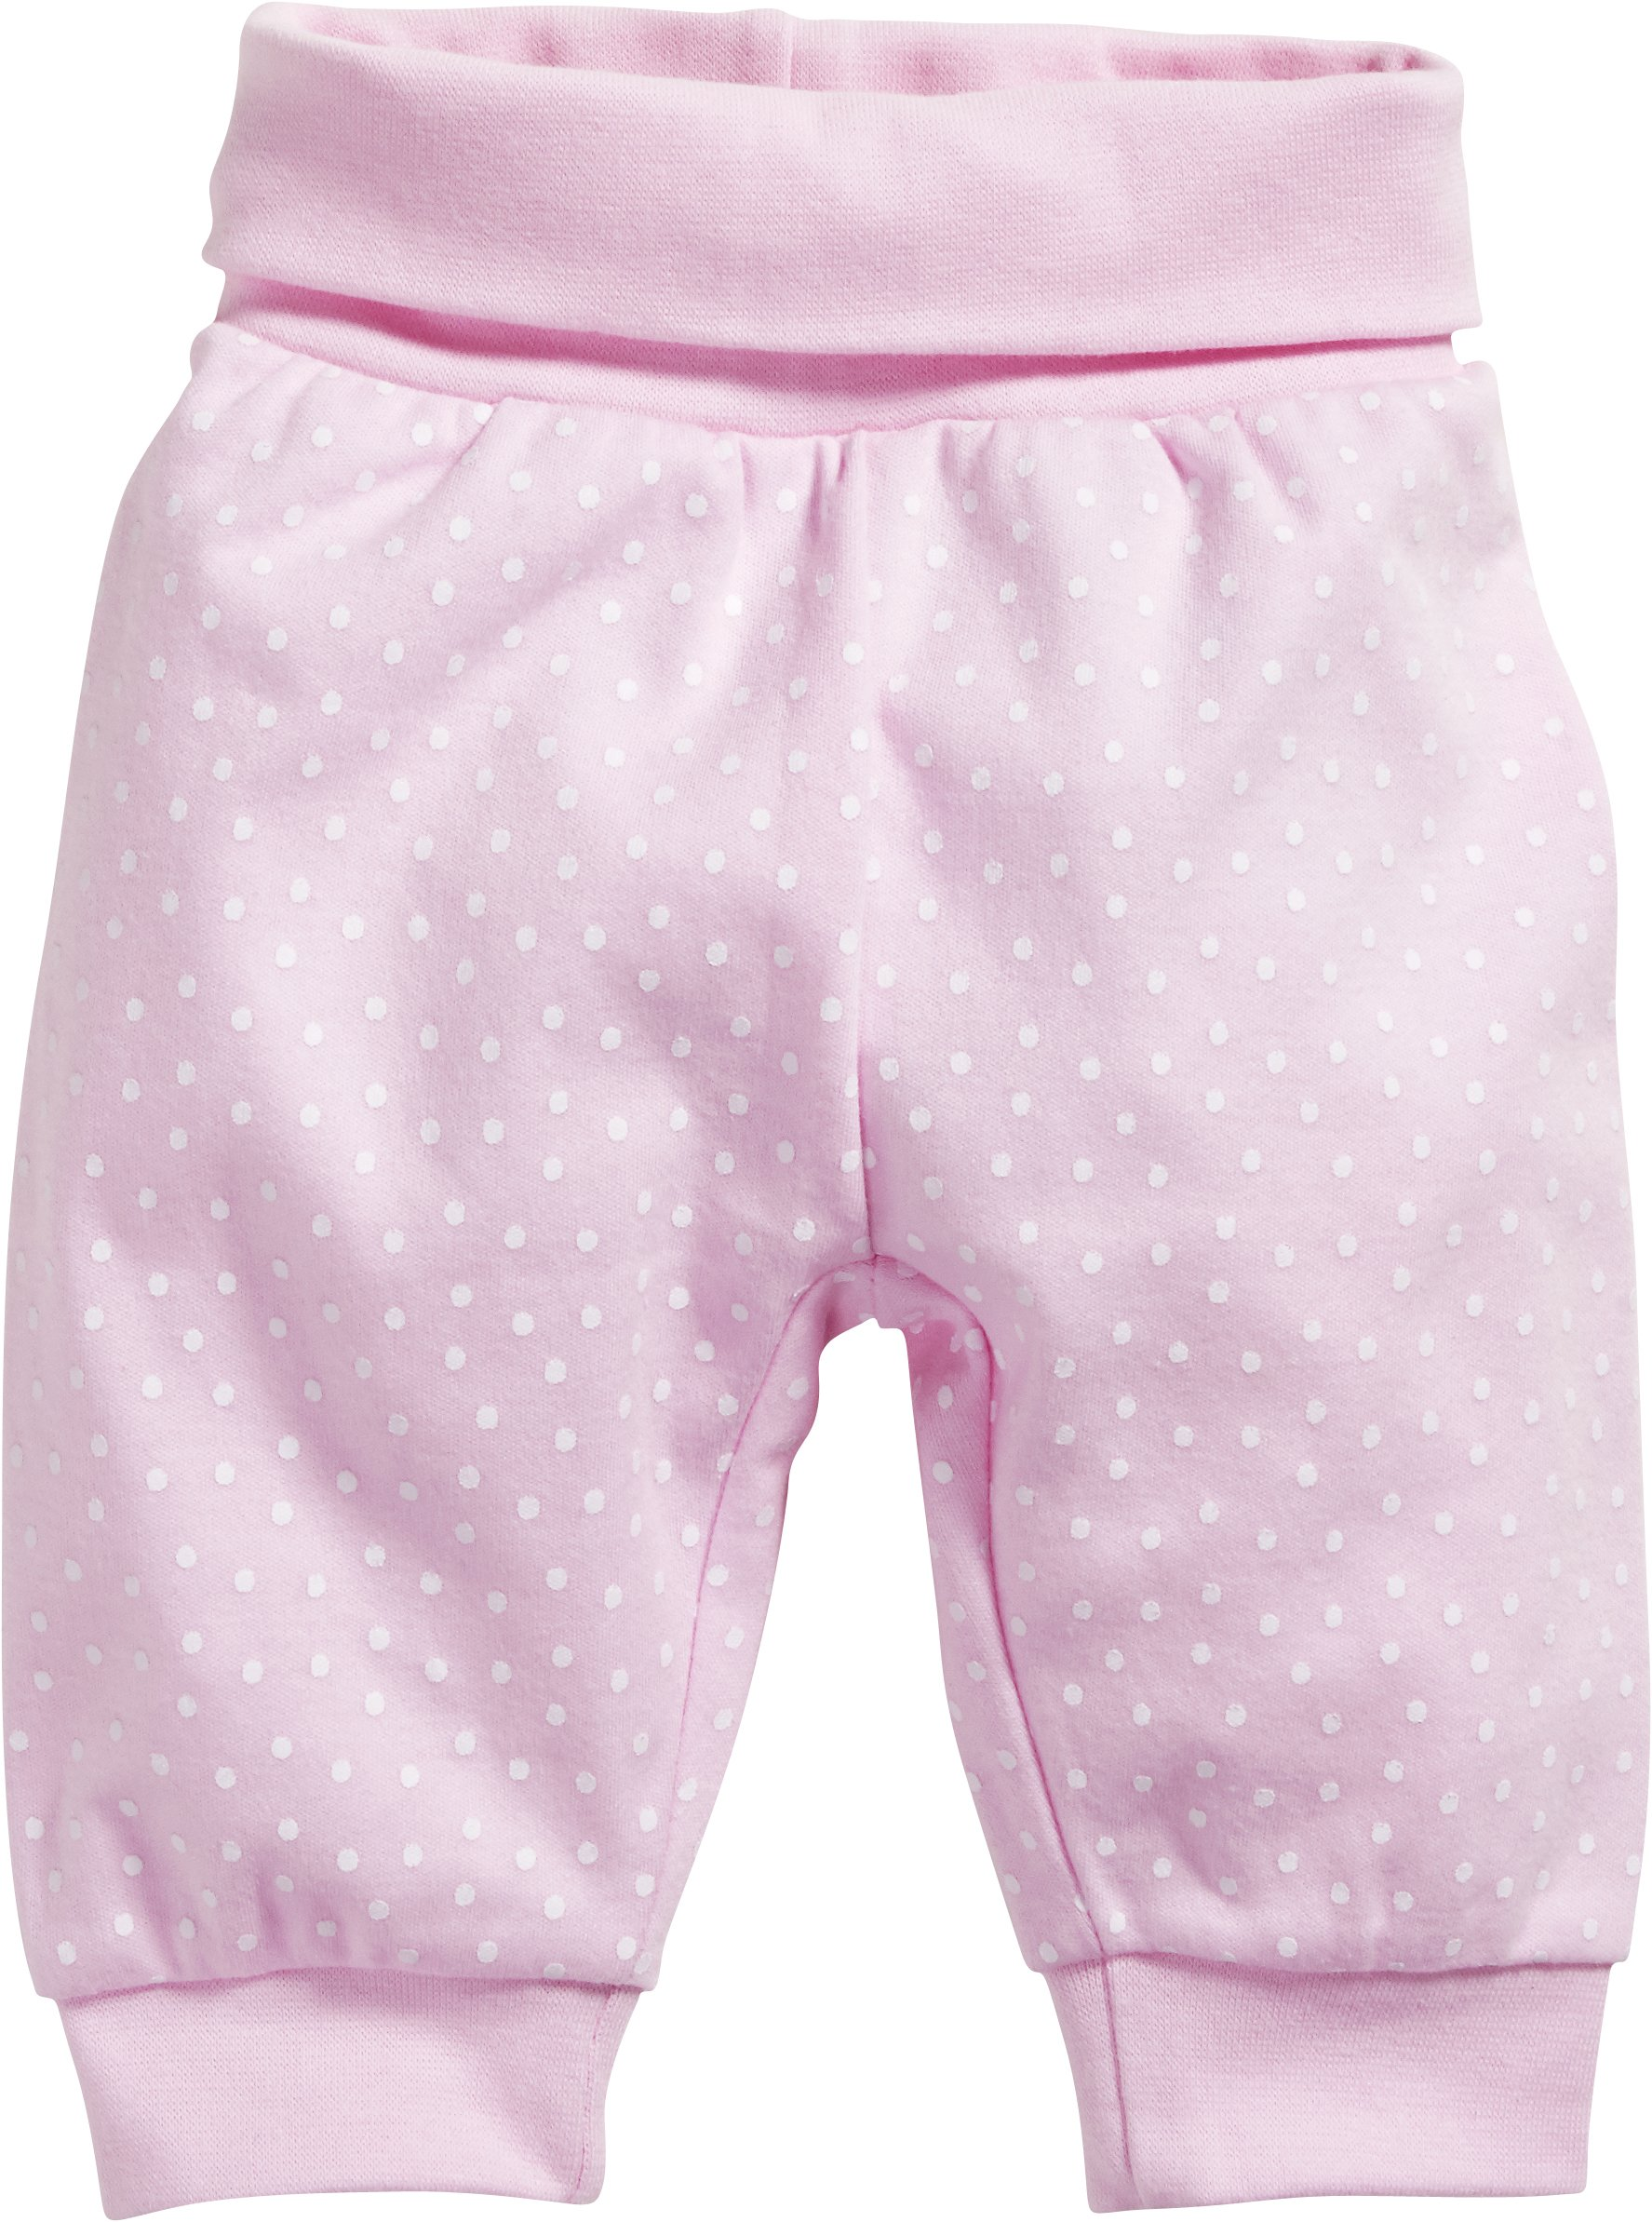 Schnizler Baby-Pumphose Interlock Punkte Pantalones de Deporte para Bebés 1